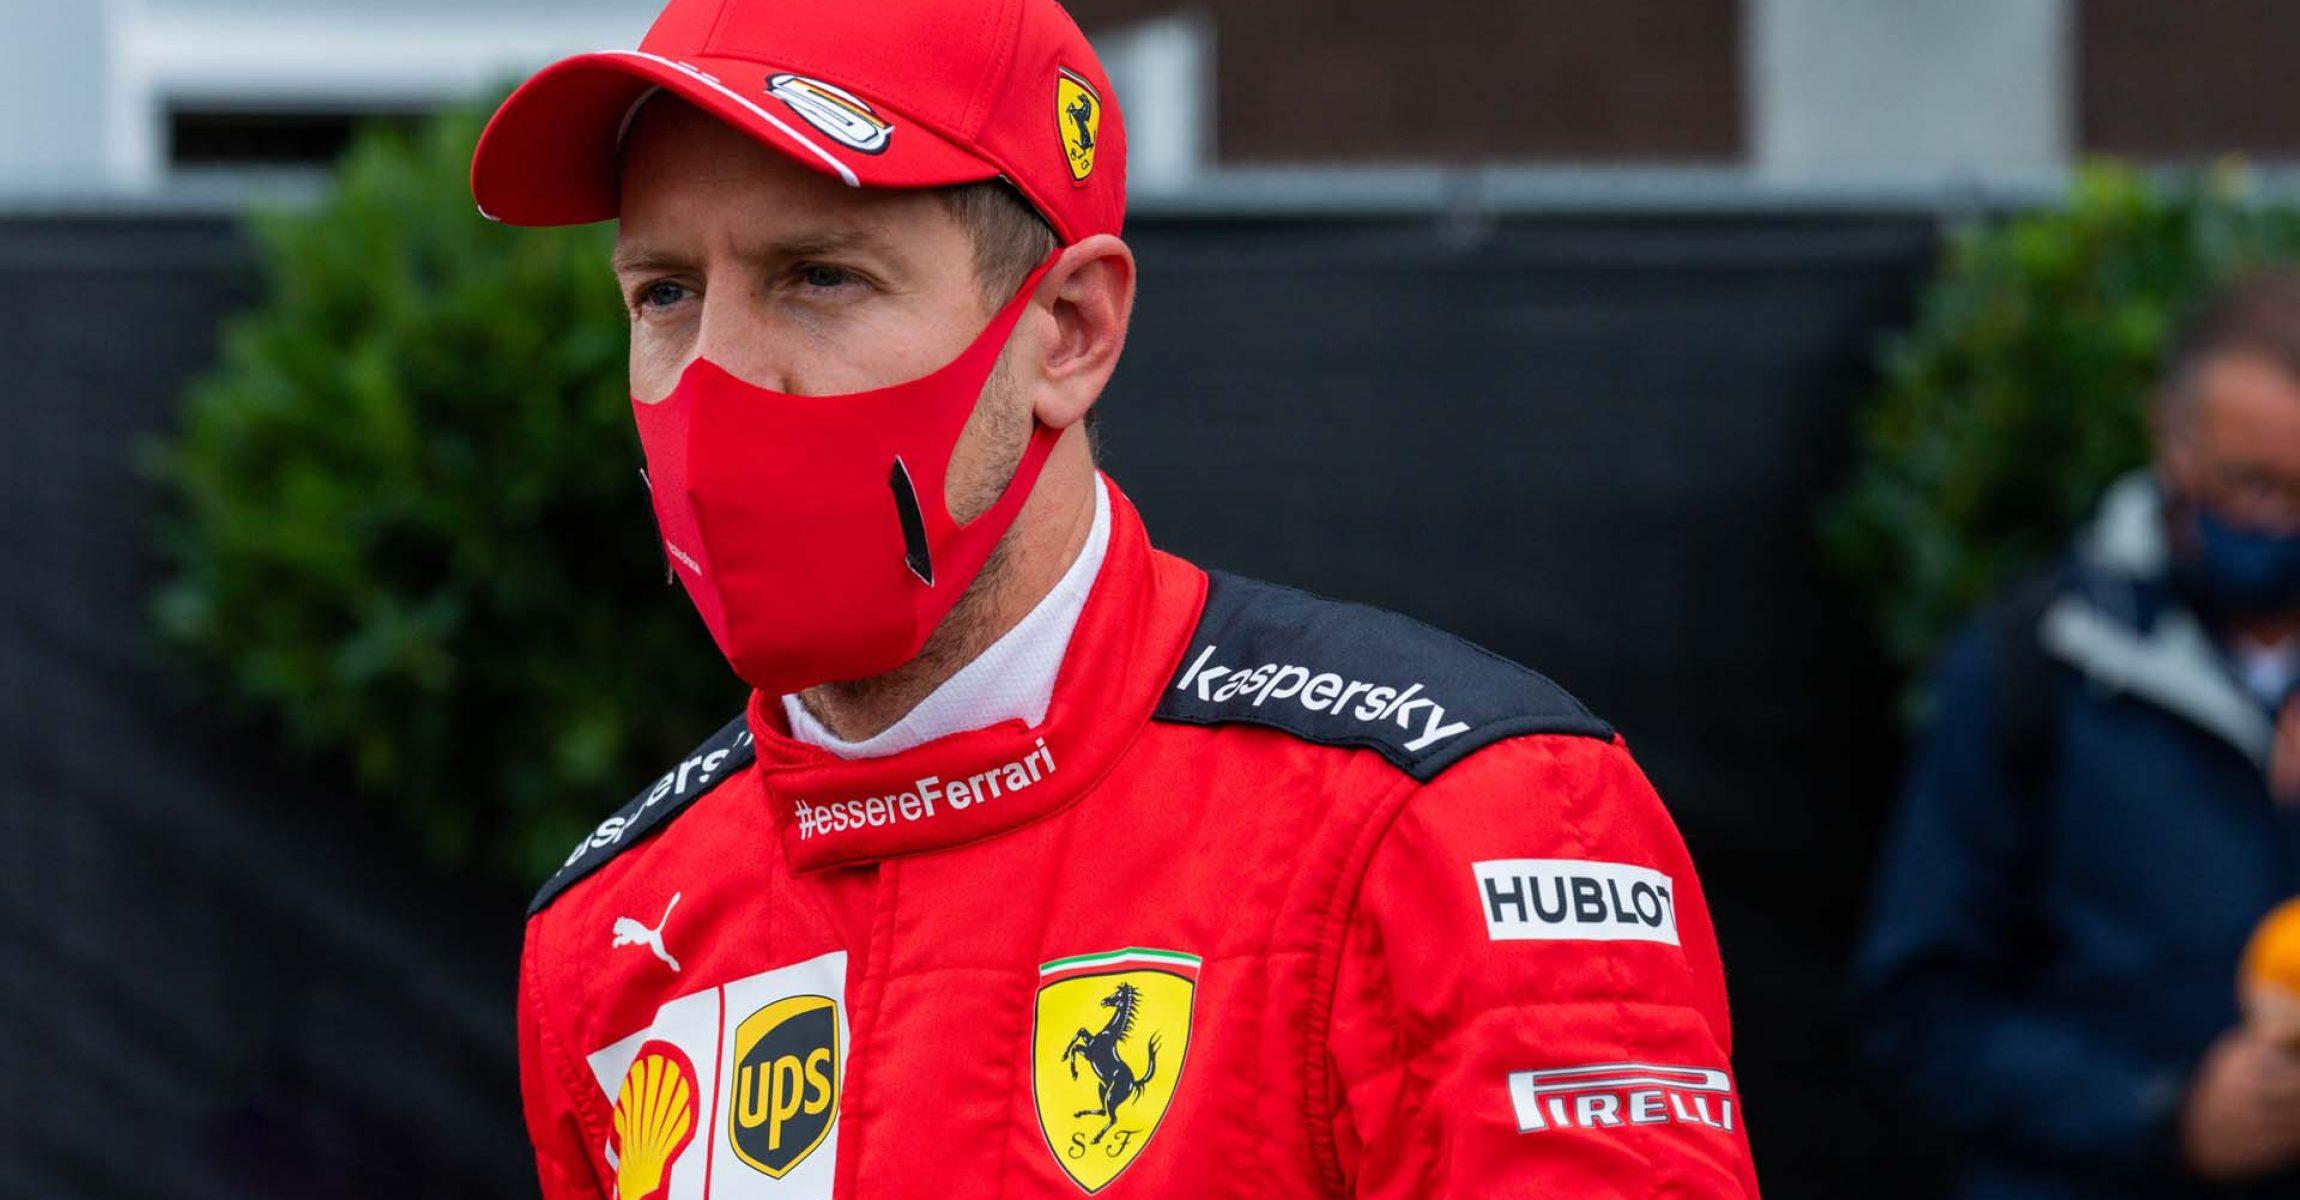 GP BELGIO F1/2020 -  SABATO 29/08/2020    credit: @Scuderia Ferrari Press Office Sebastian Vettel